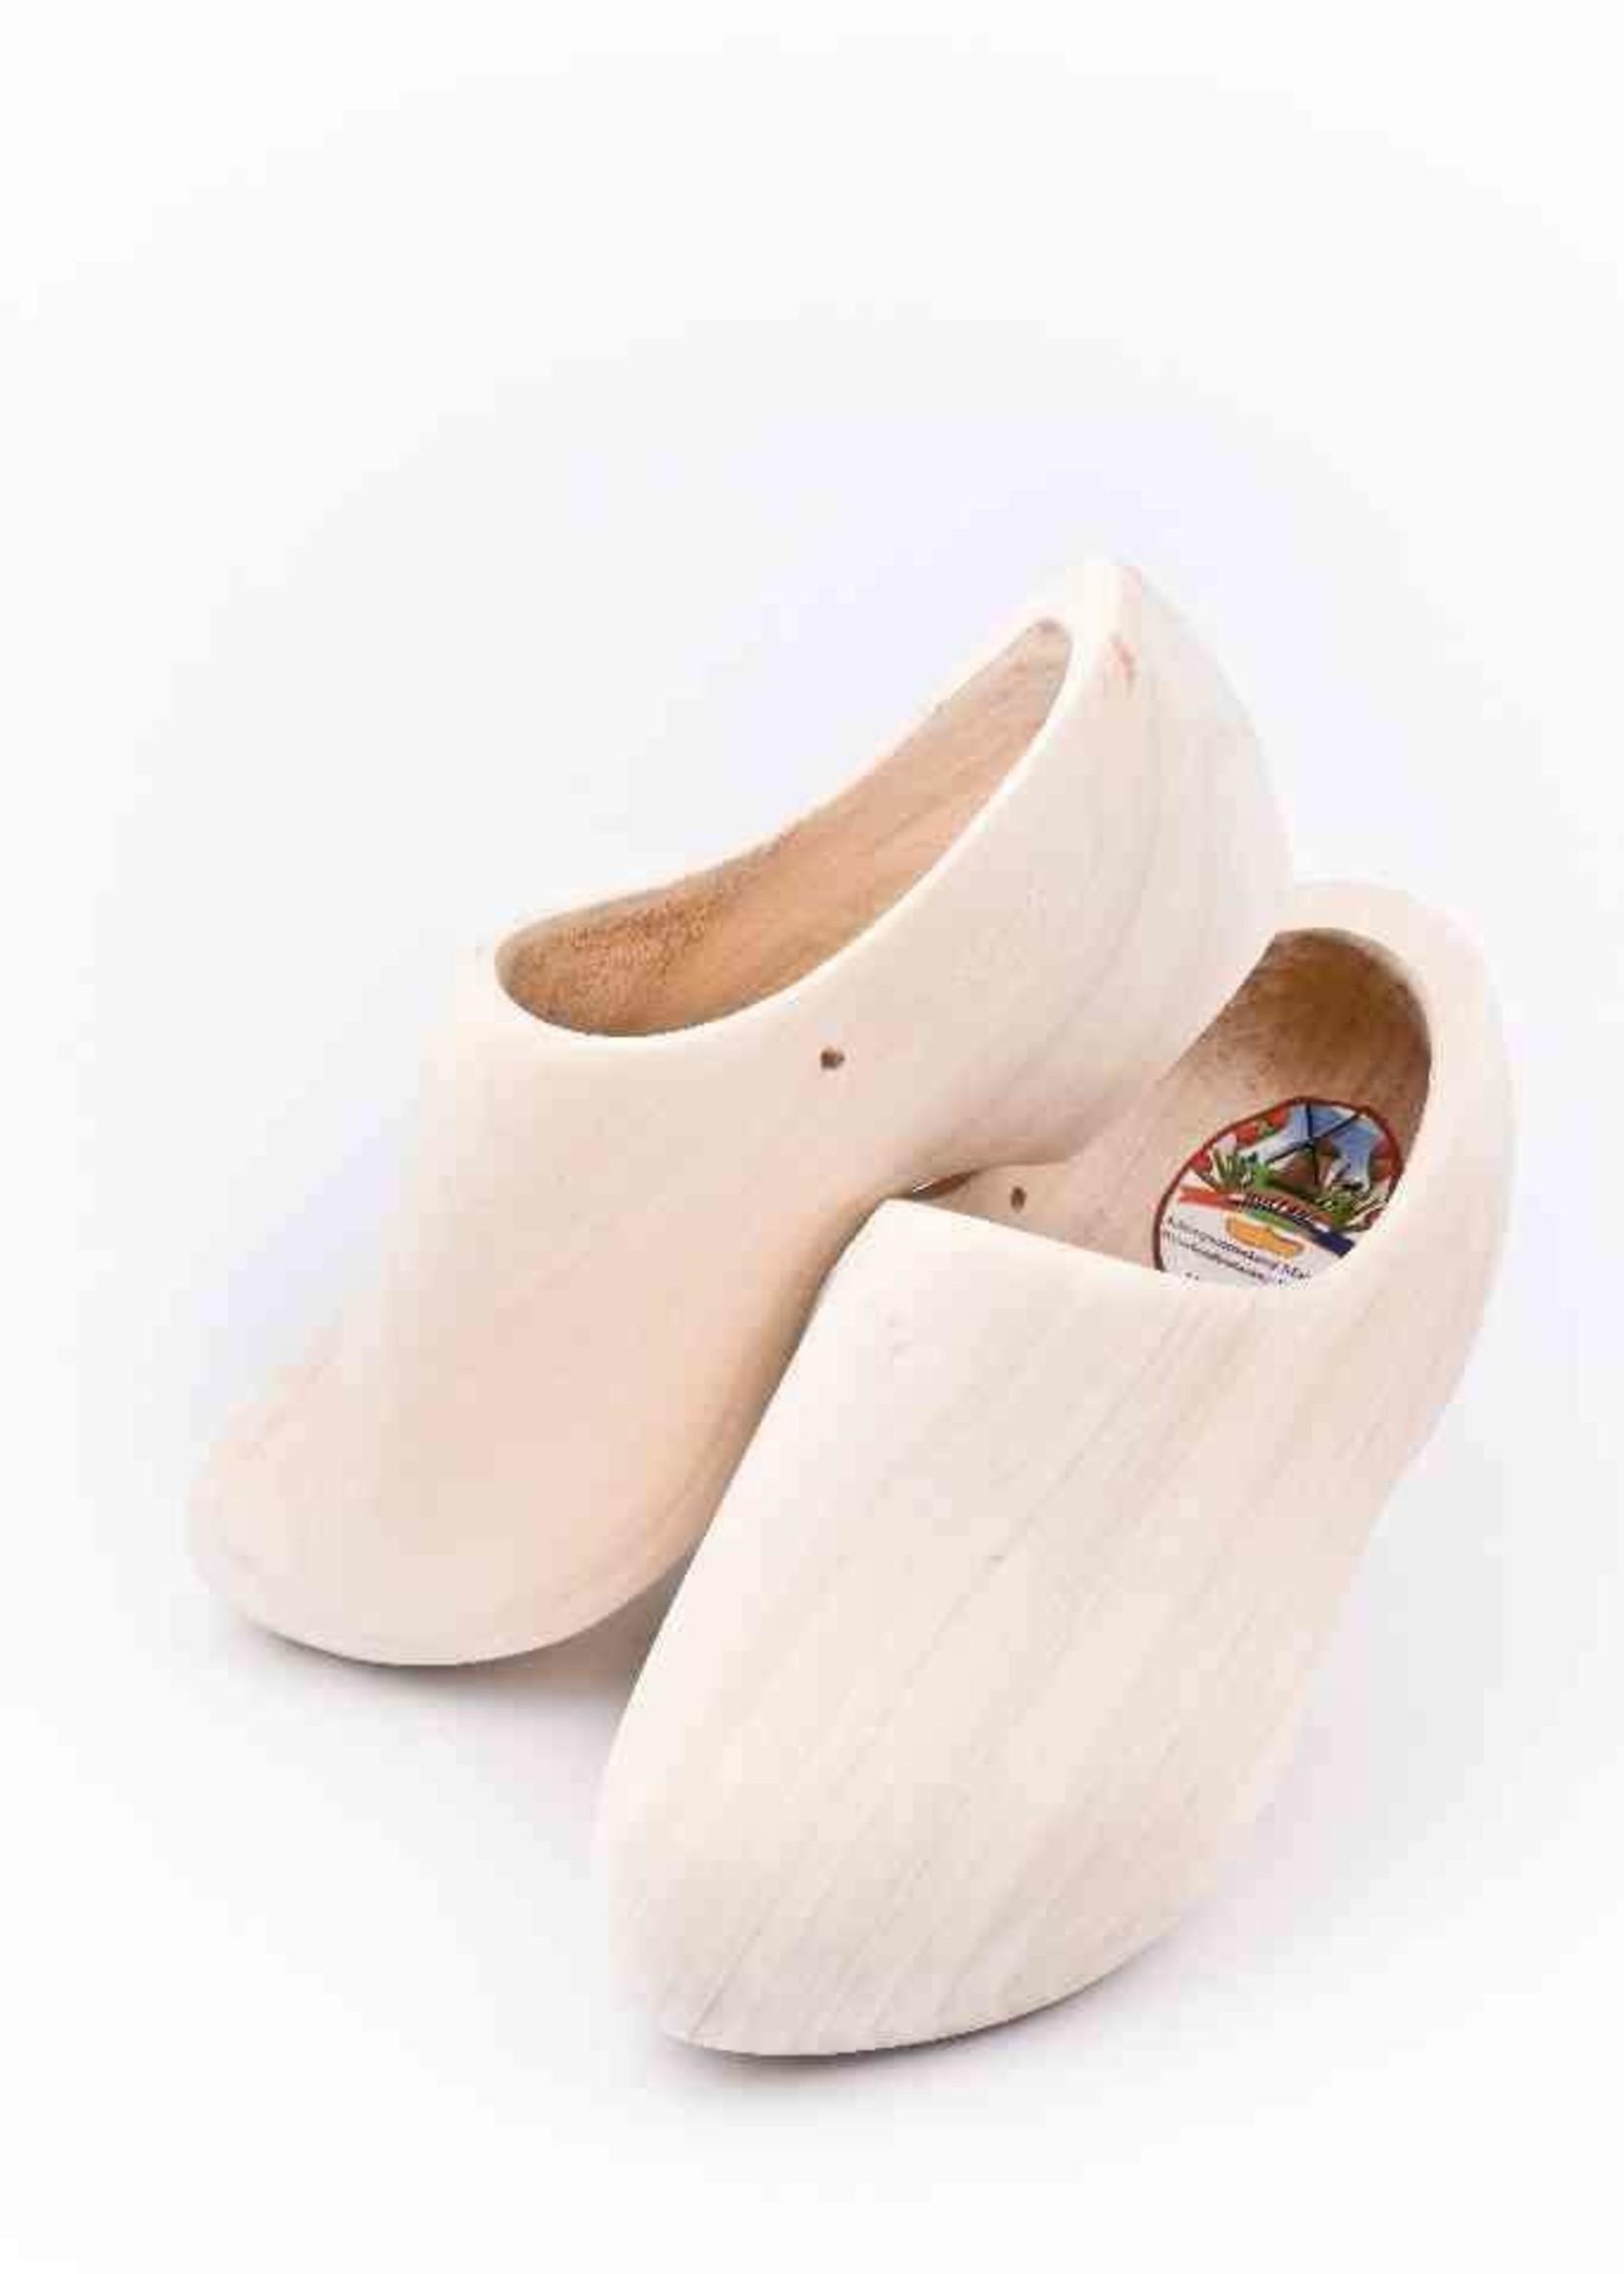 Wooden Shoe Factory Marken Klompen, Blank Geschuurd